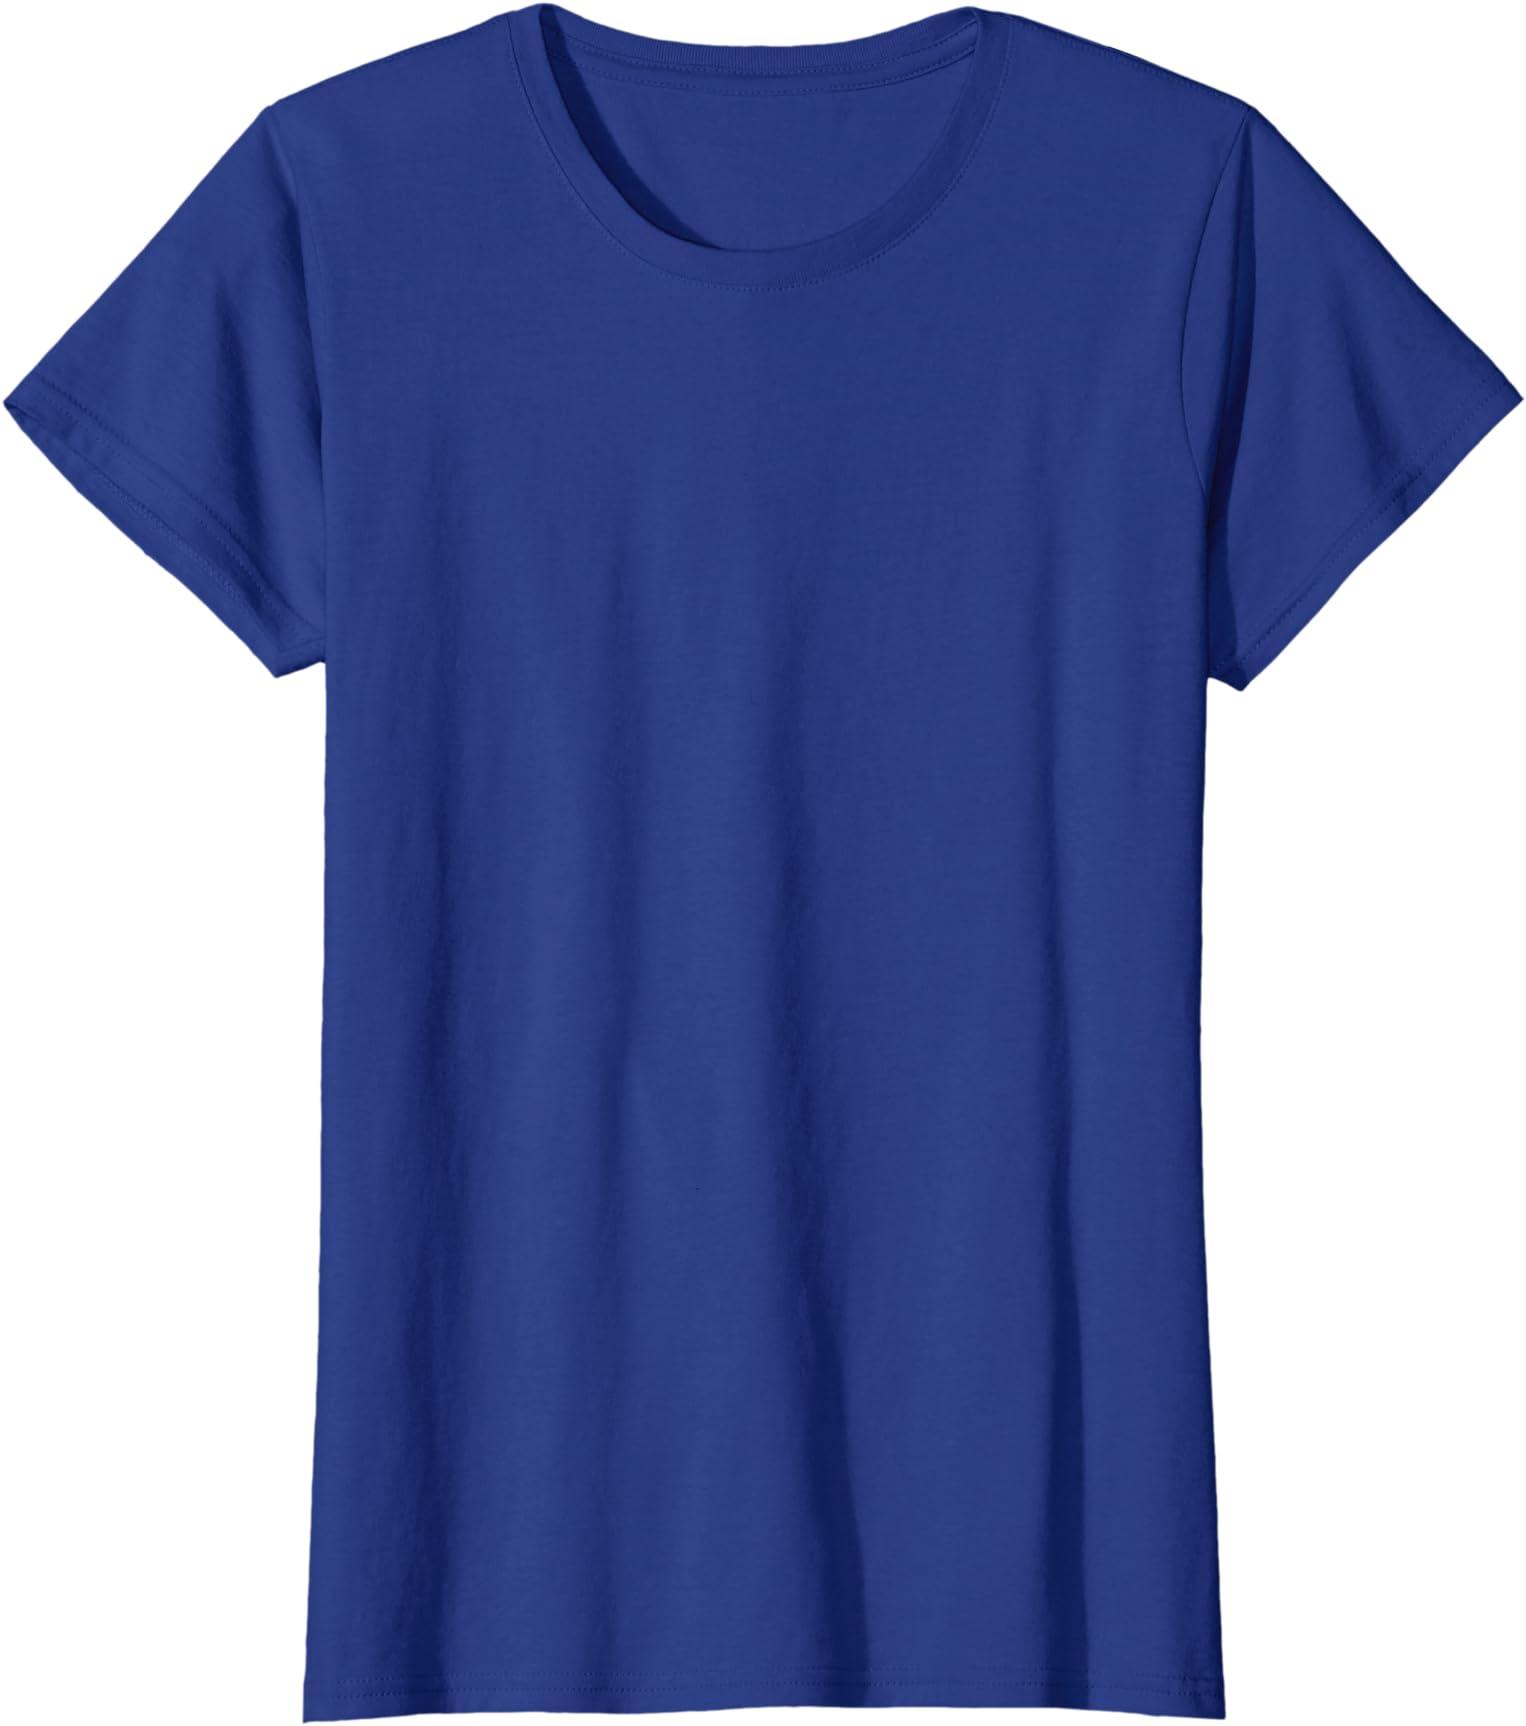 I Love You Decor Childrens Short Sleeve Cool T-Shirt,Polyester,Little Girl Givi